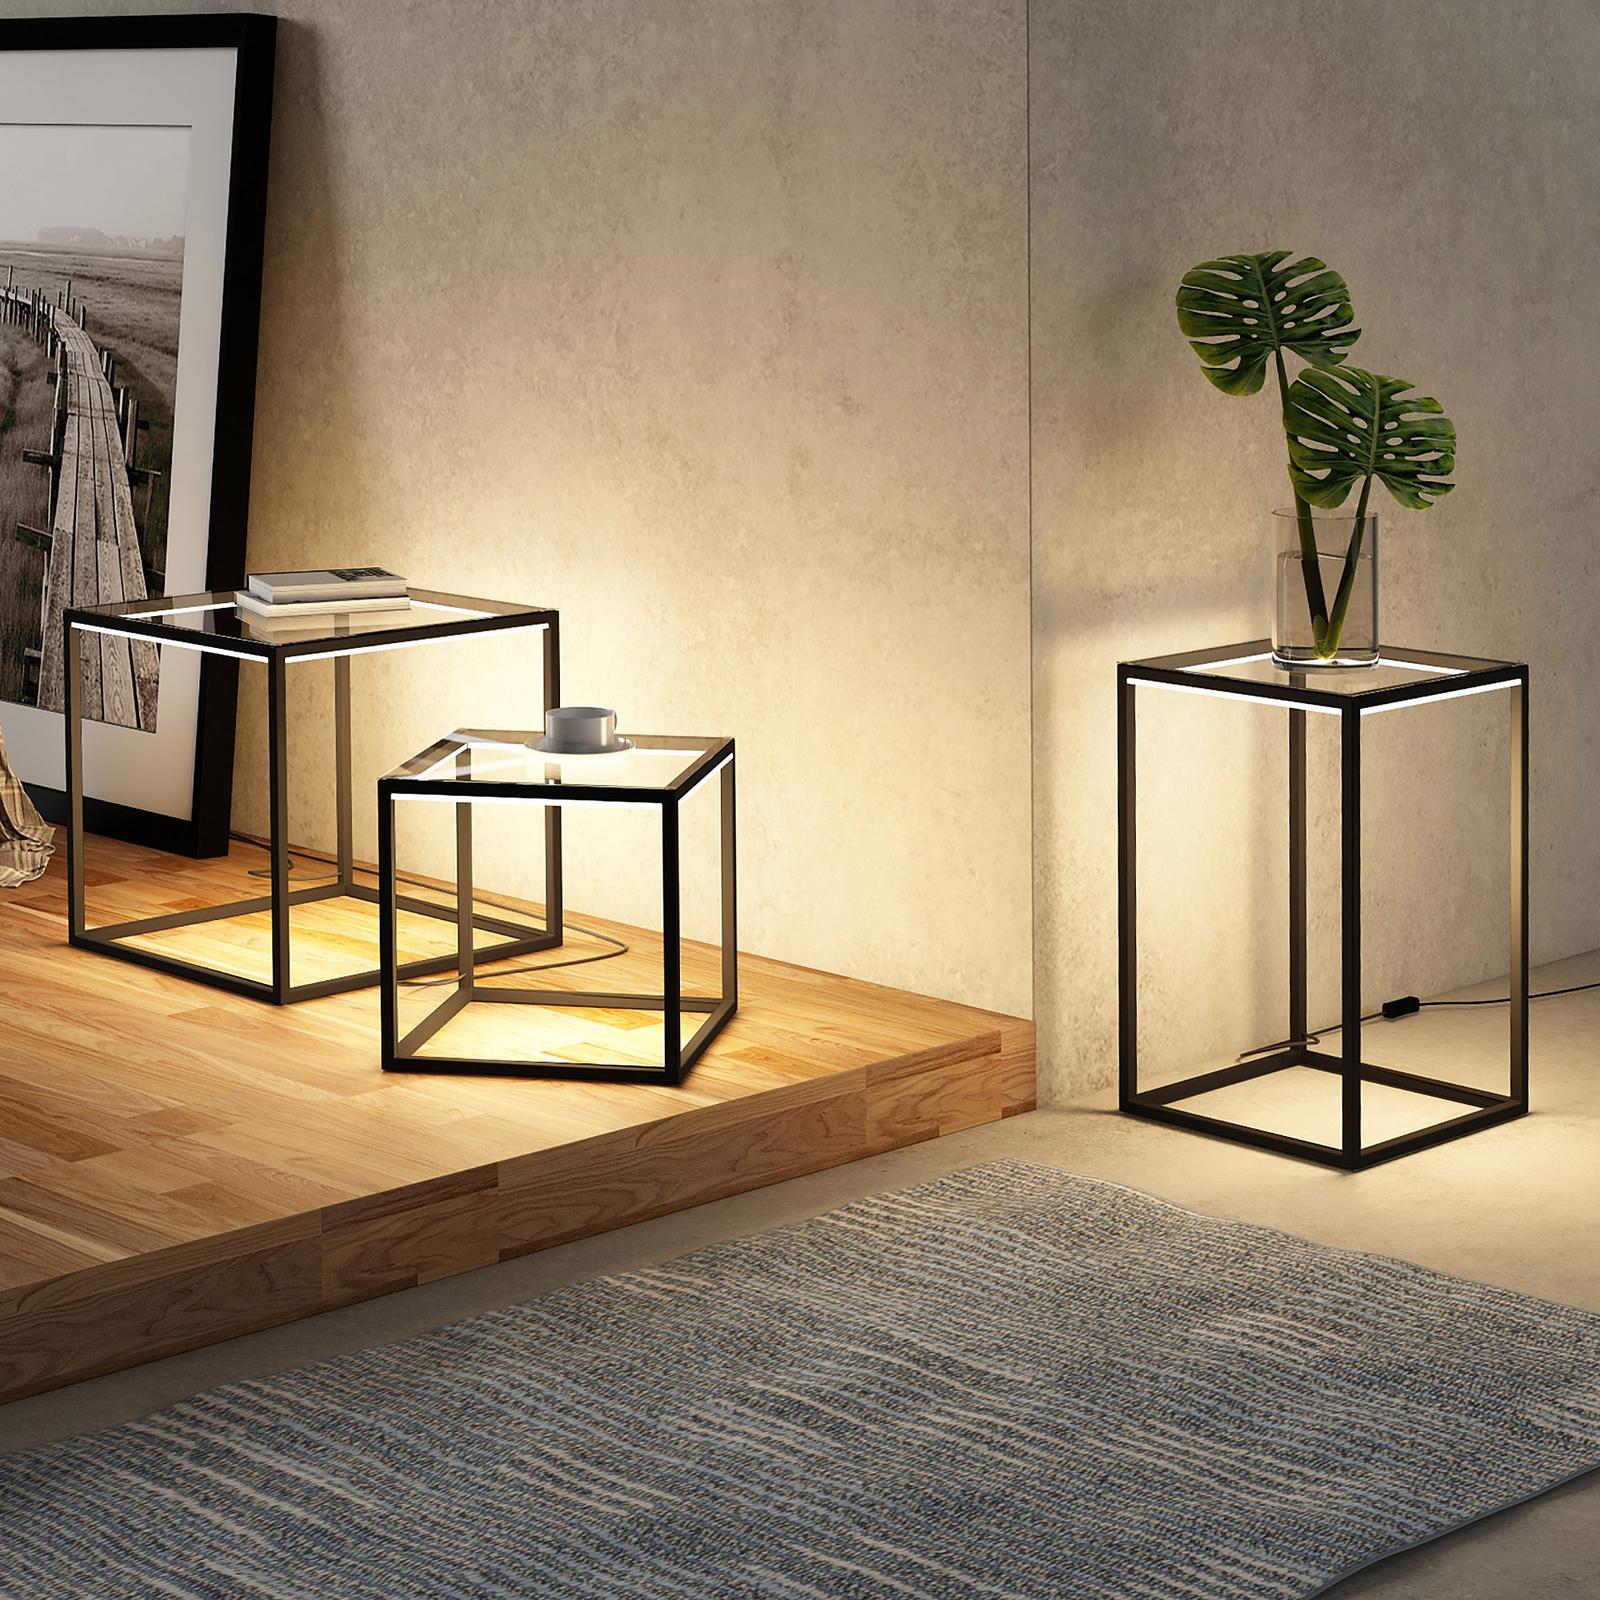 Lindby Kagus lámpara de mesa LED, set de 3 ud